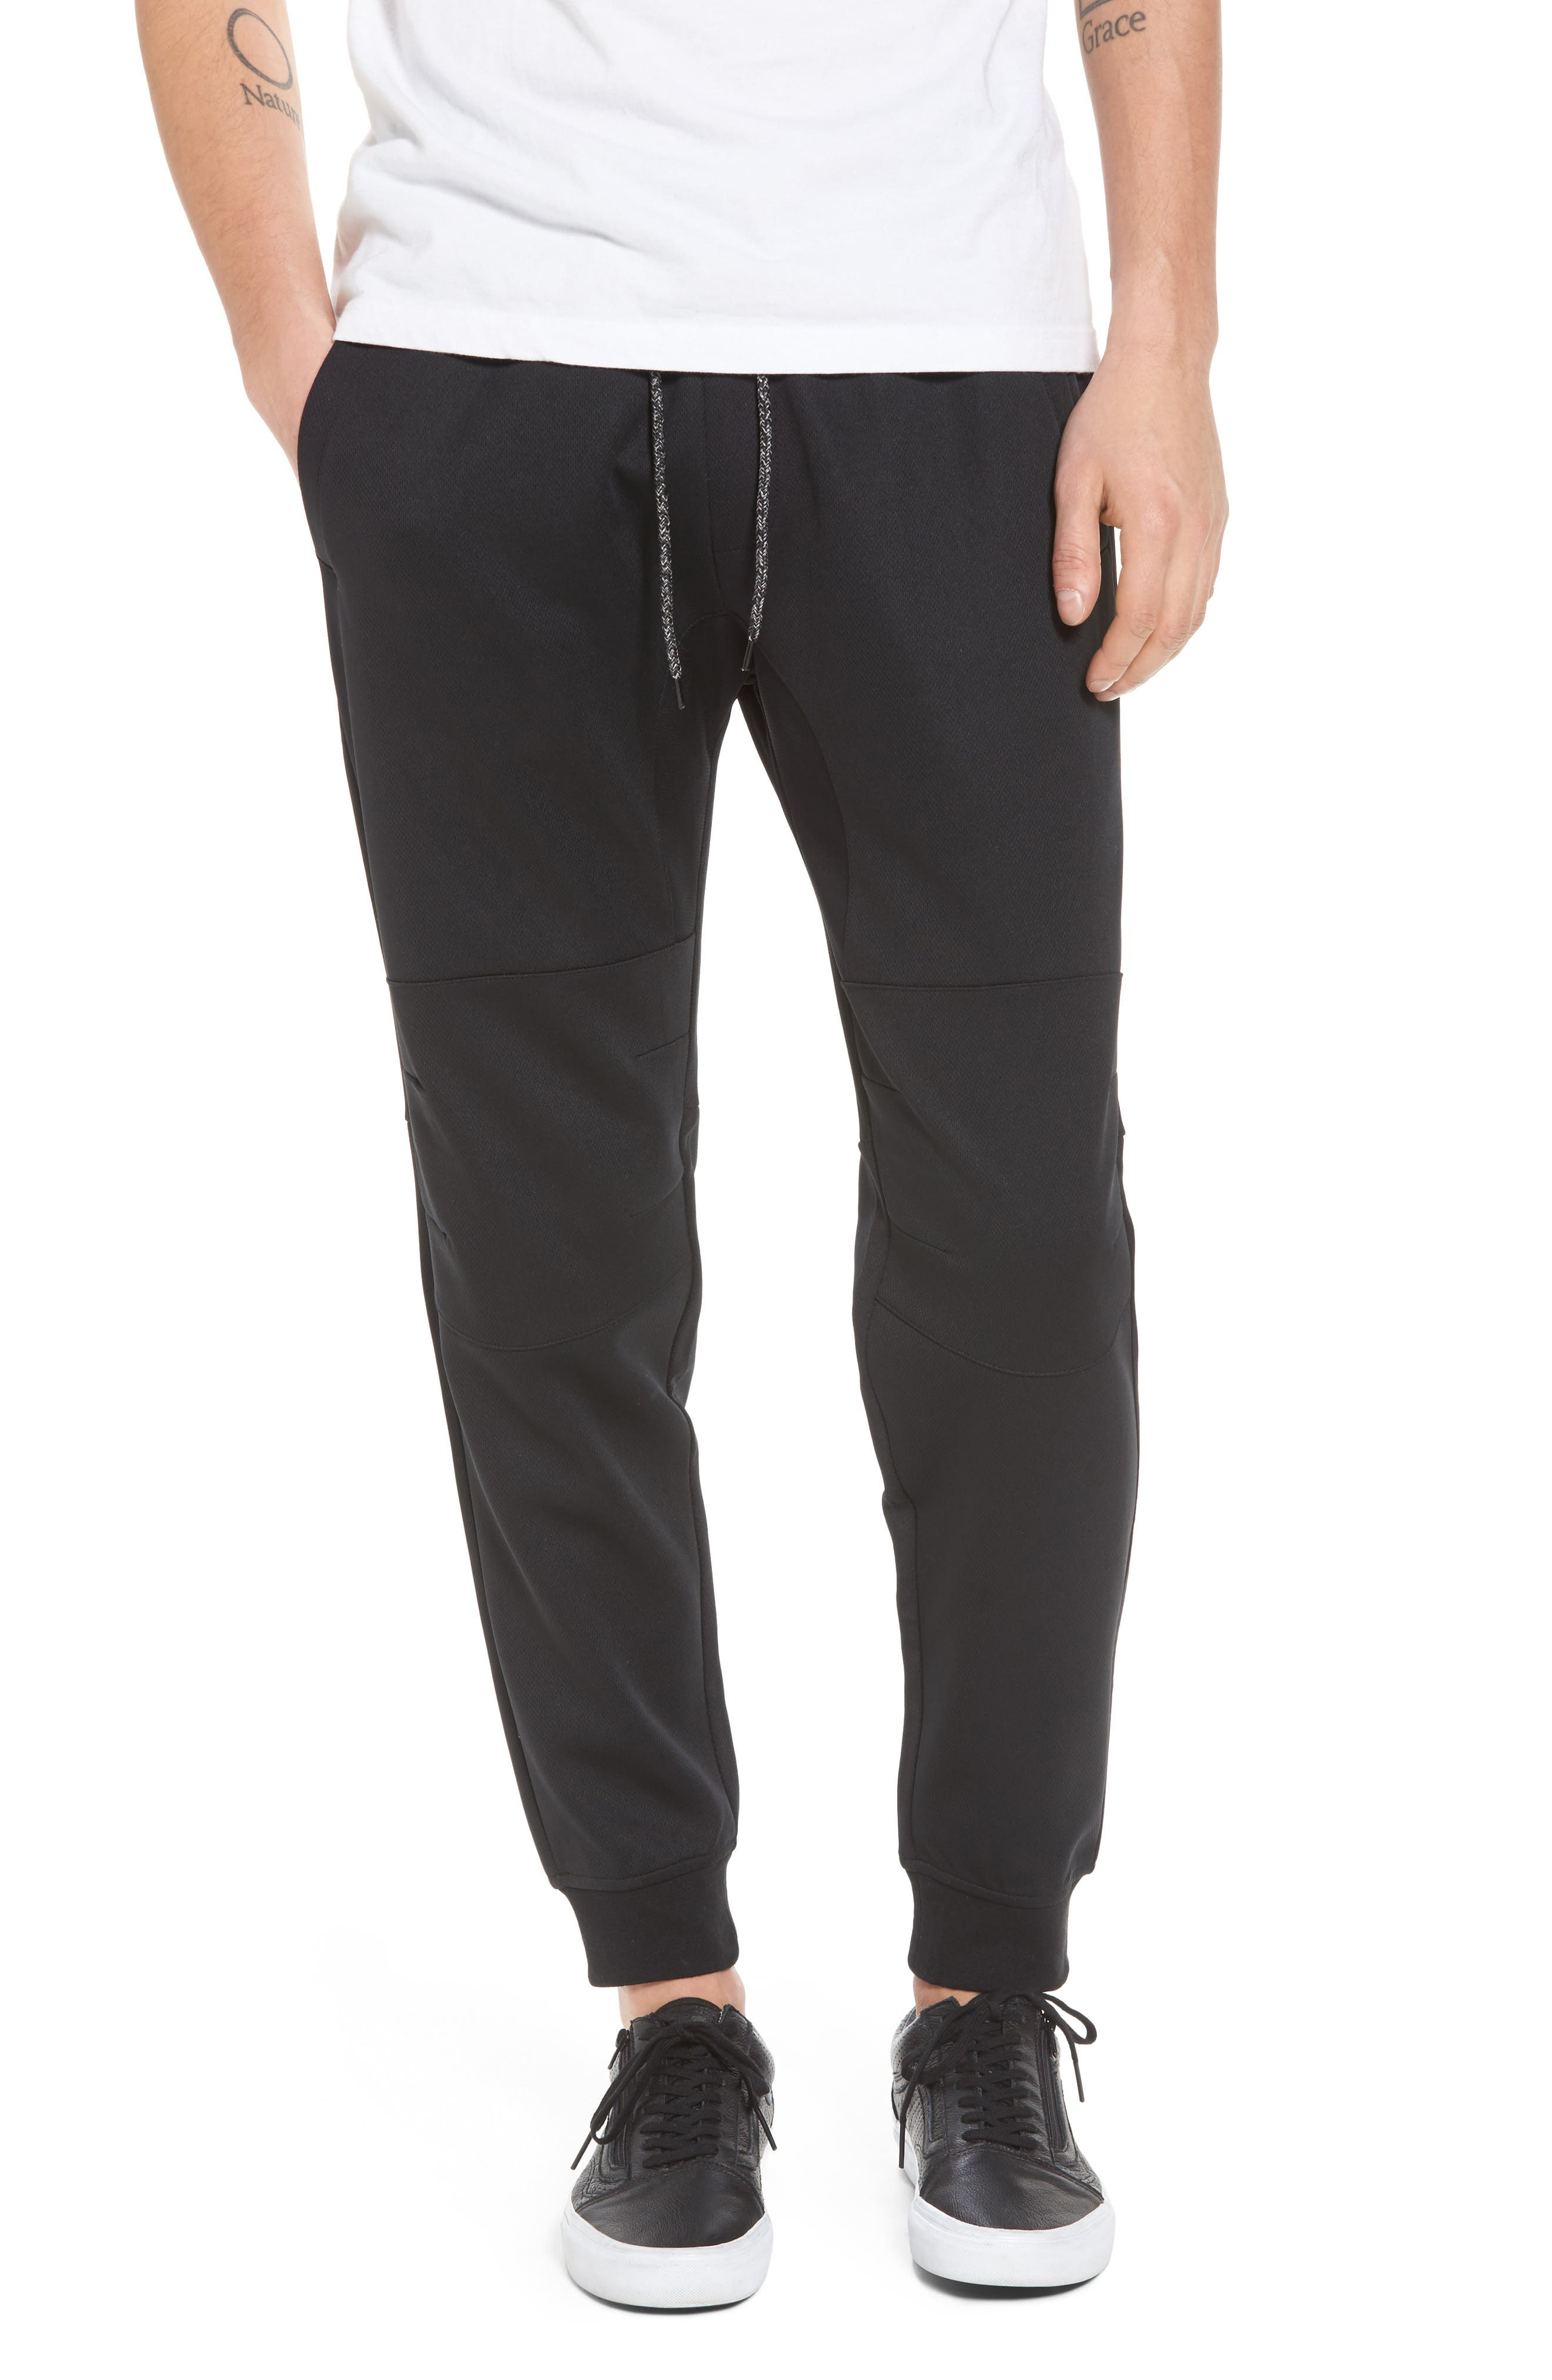 Mesh Jogger Pants,                         Main,                         color,